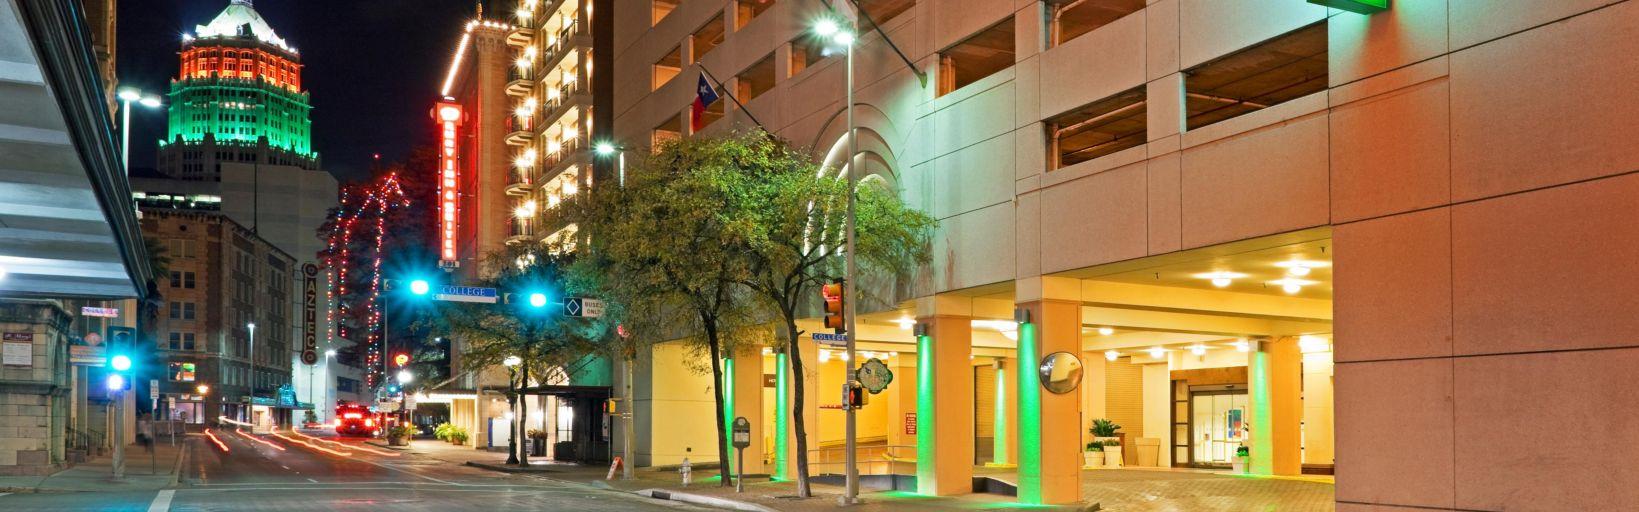 Holiday Inn San Antonio-Riverwalk Hotel by IHG